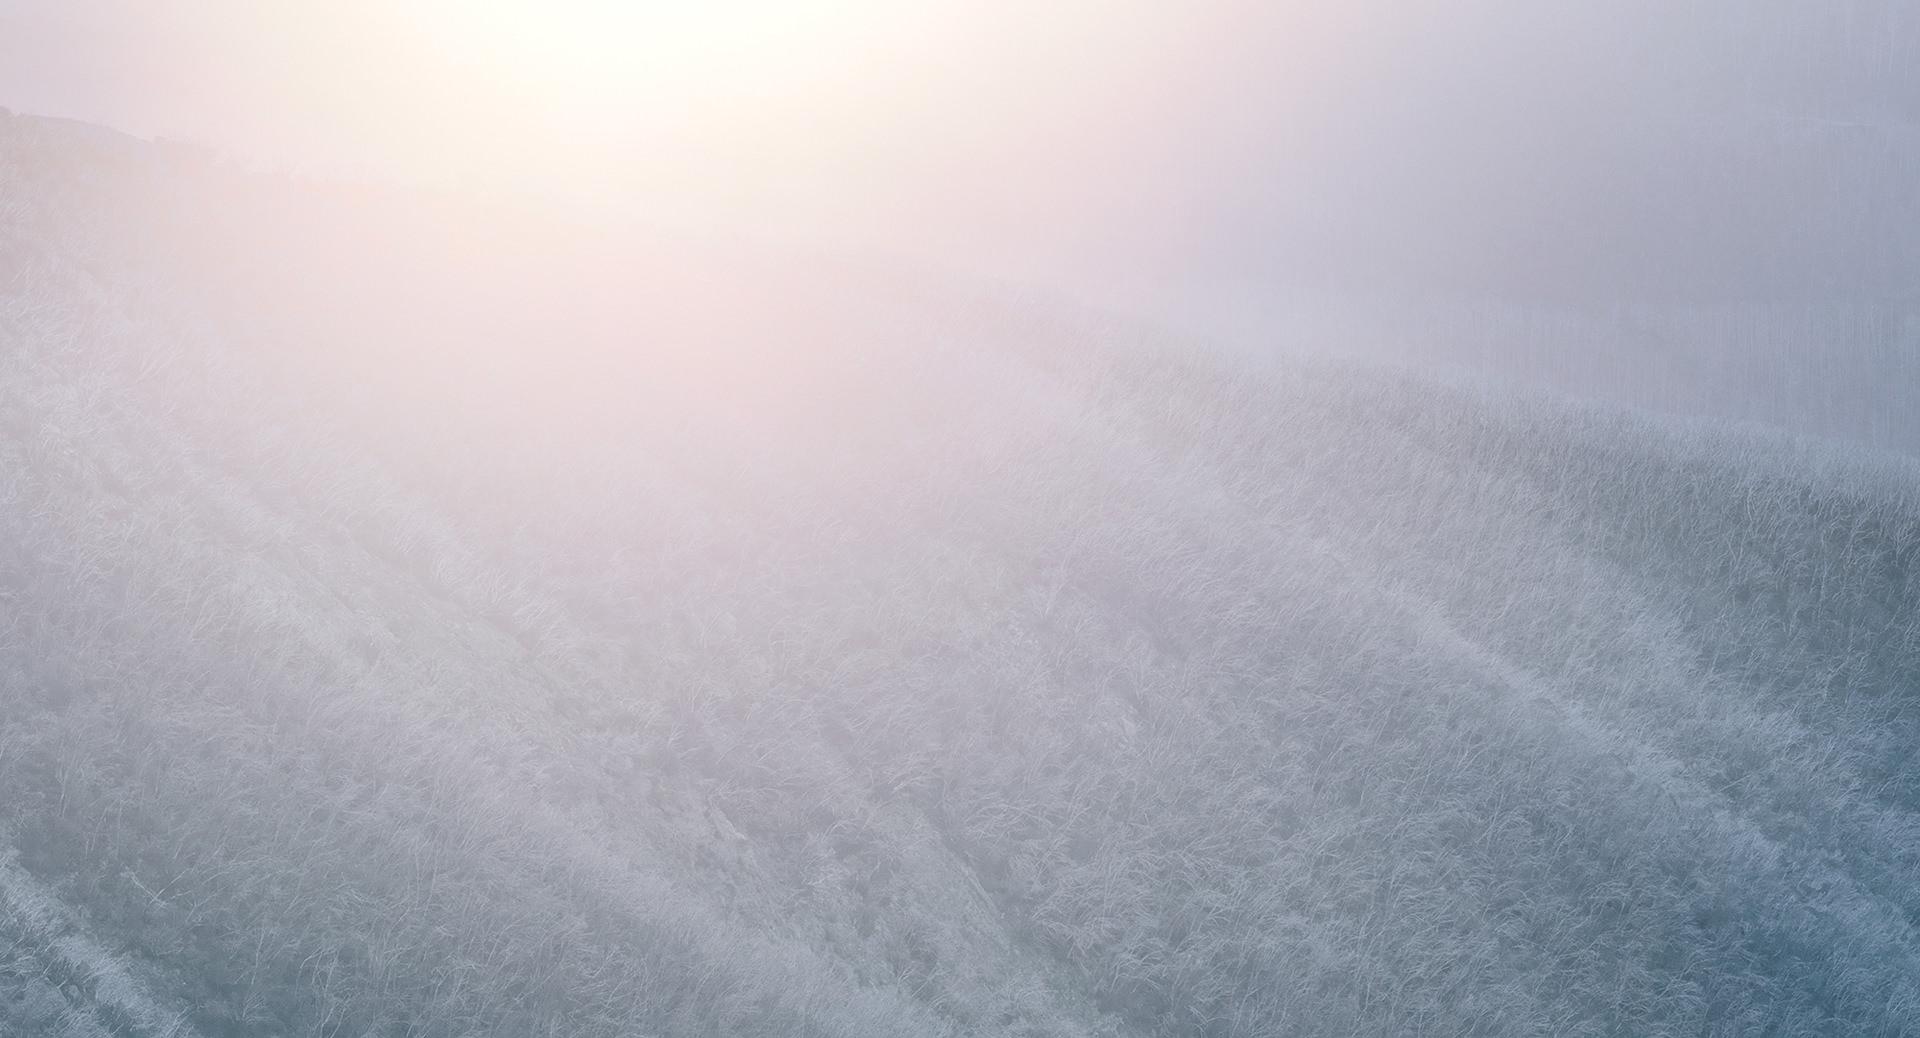 ©ankeluckmann1553p, landscape,mountain, white, elisabeth winter, anke luckmann, www.ankeluckmann.com